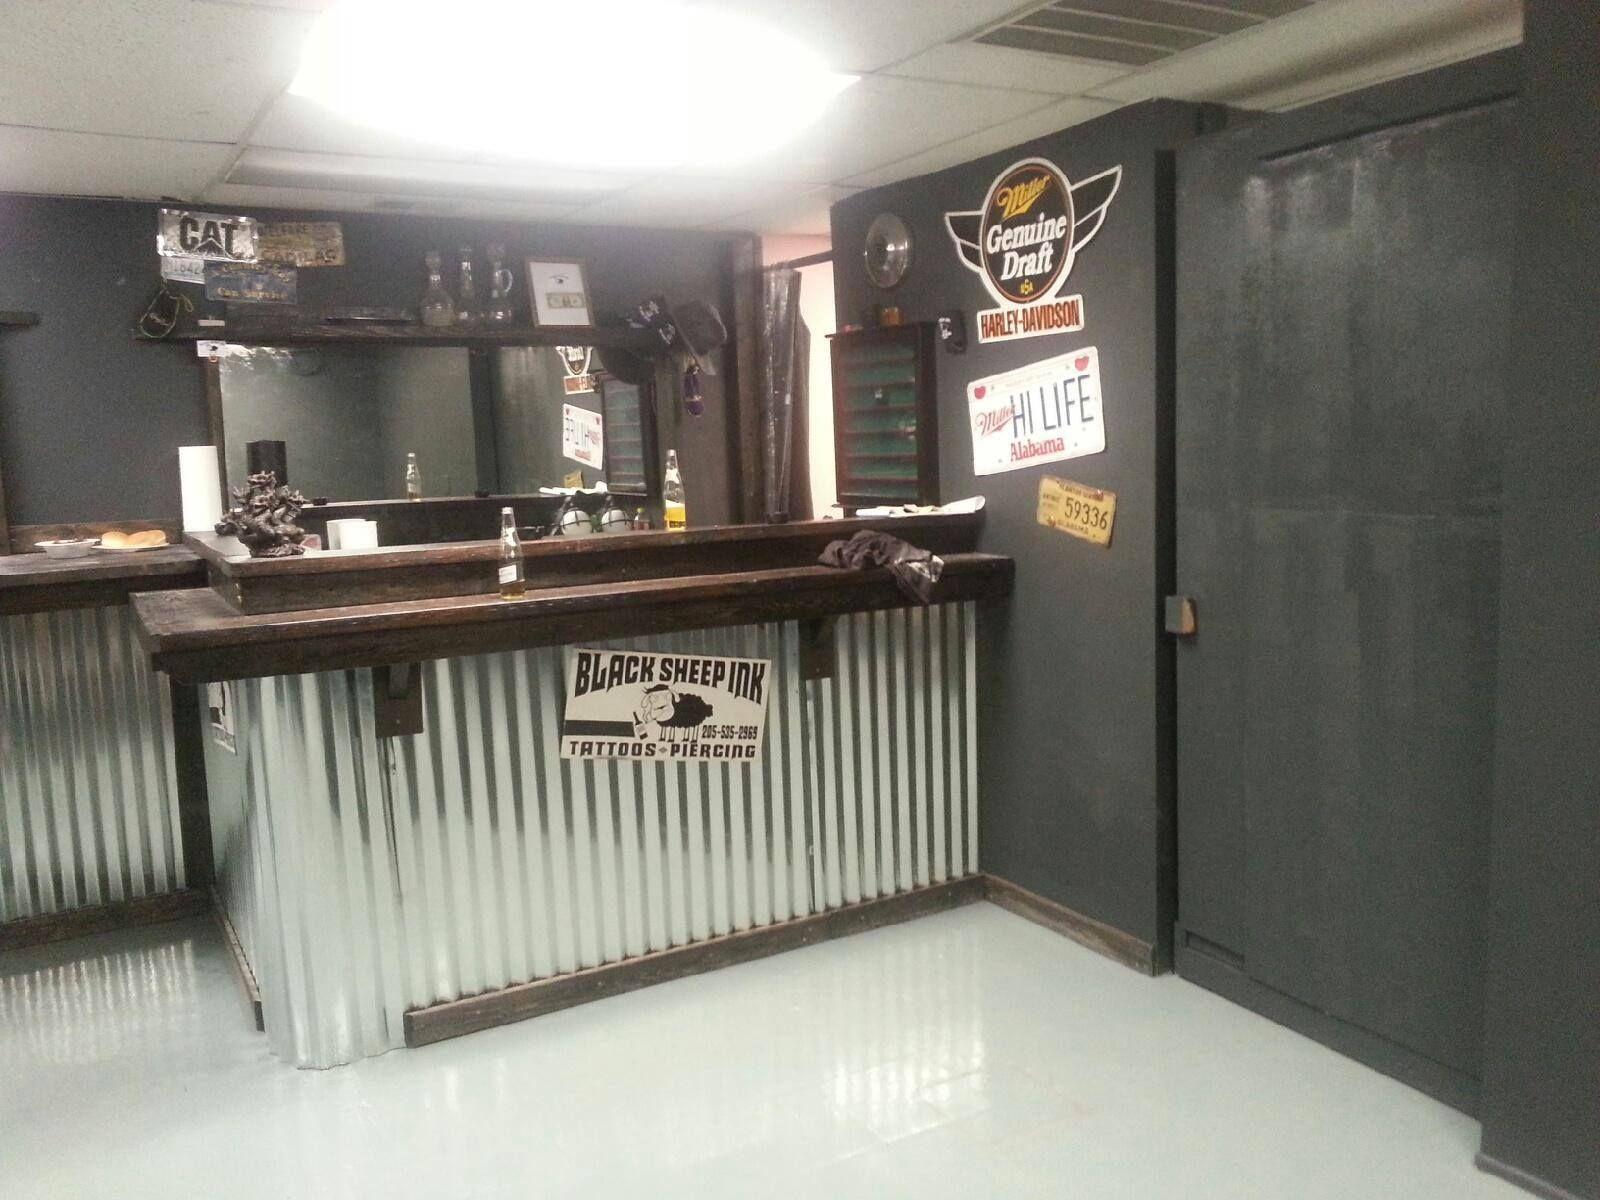 Https Www Facebook Com Pages Black Sheep Ink 270640919682041 Home Decor Home Liquor Cabinet